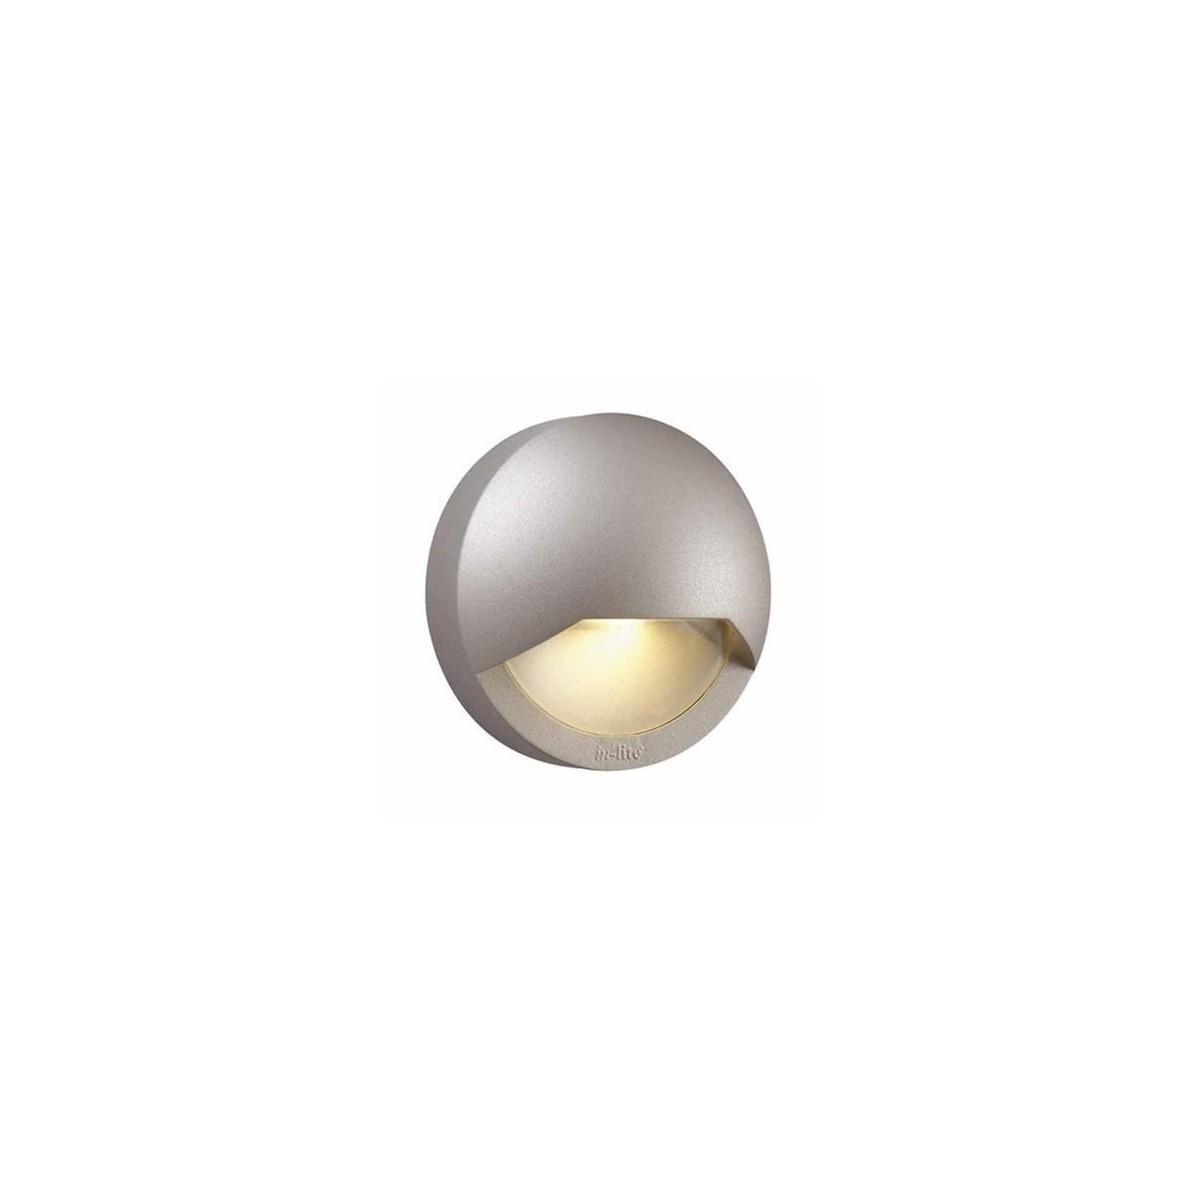 BLINK, LED 12 V/1,5 W, śr. 10 cm, gr. 48 mm, zasięg 1,5 m,